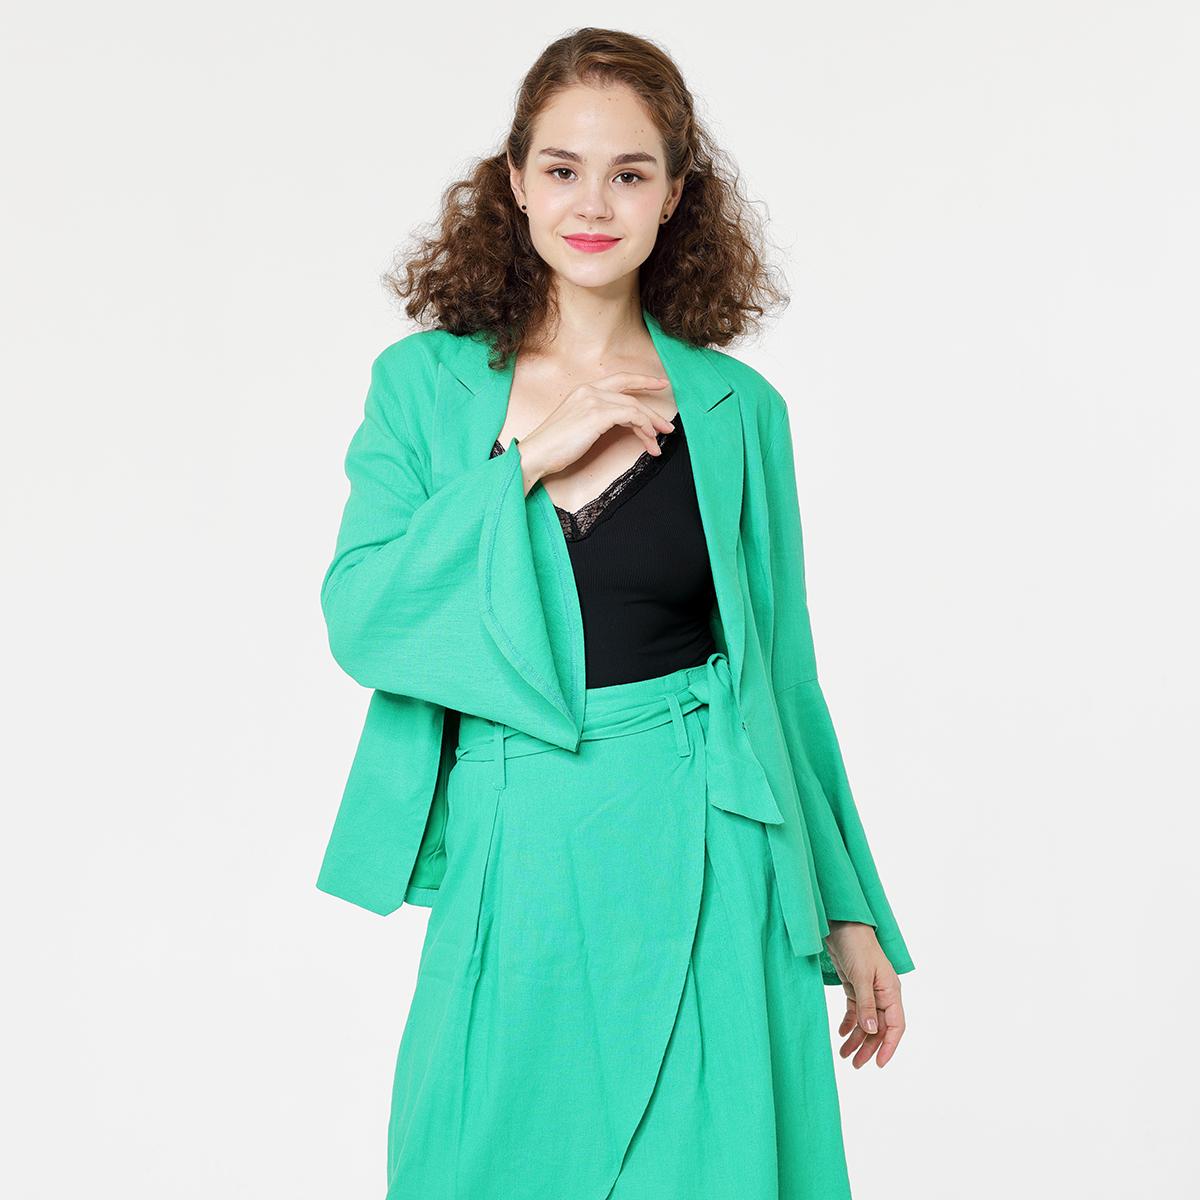 Linen viscose Lady's blazer set